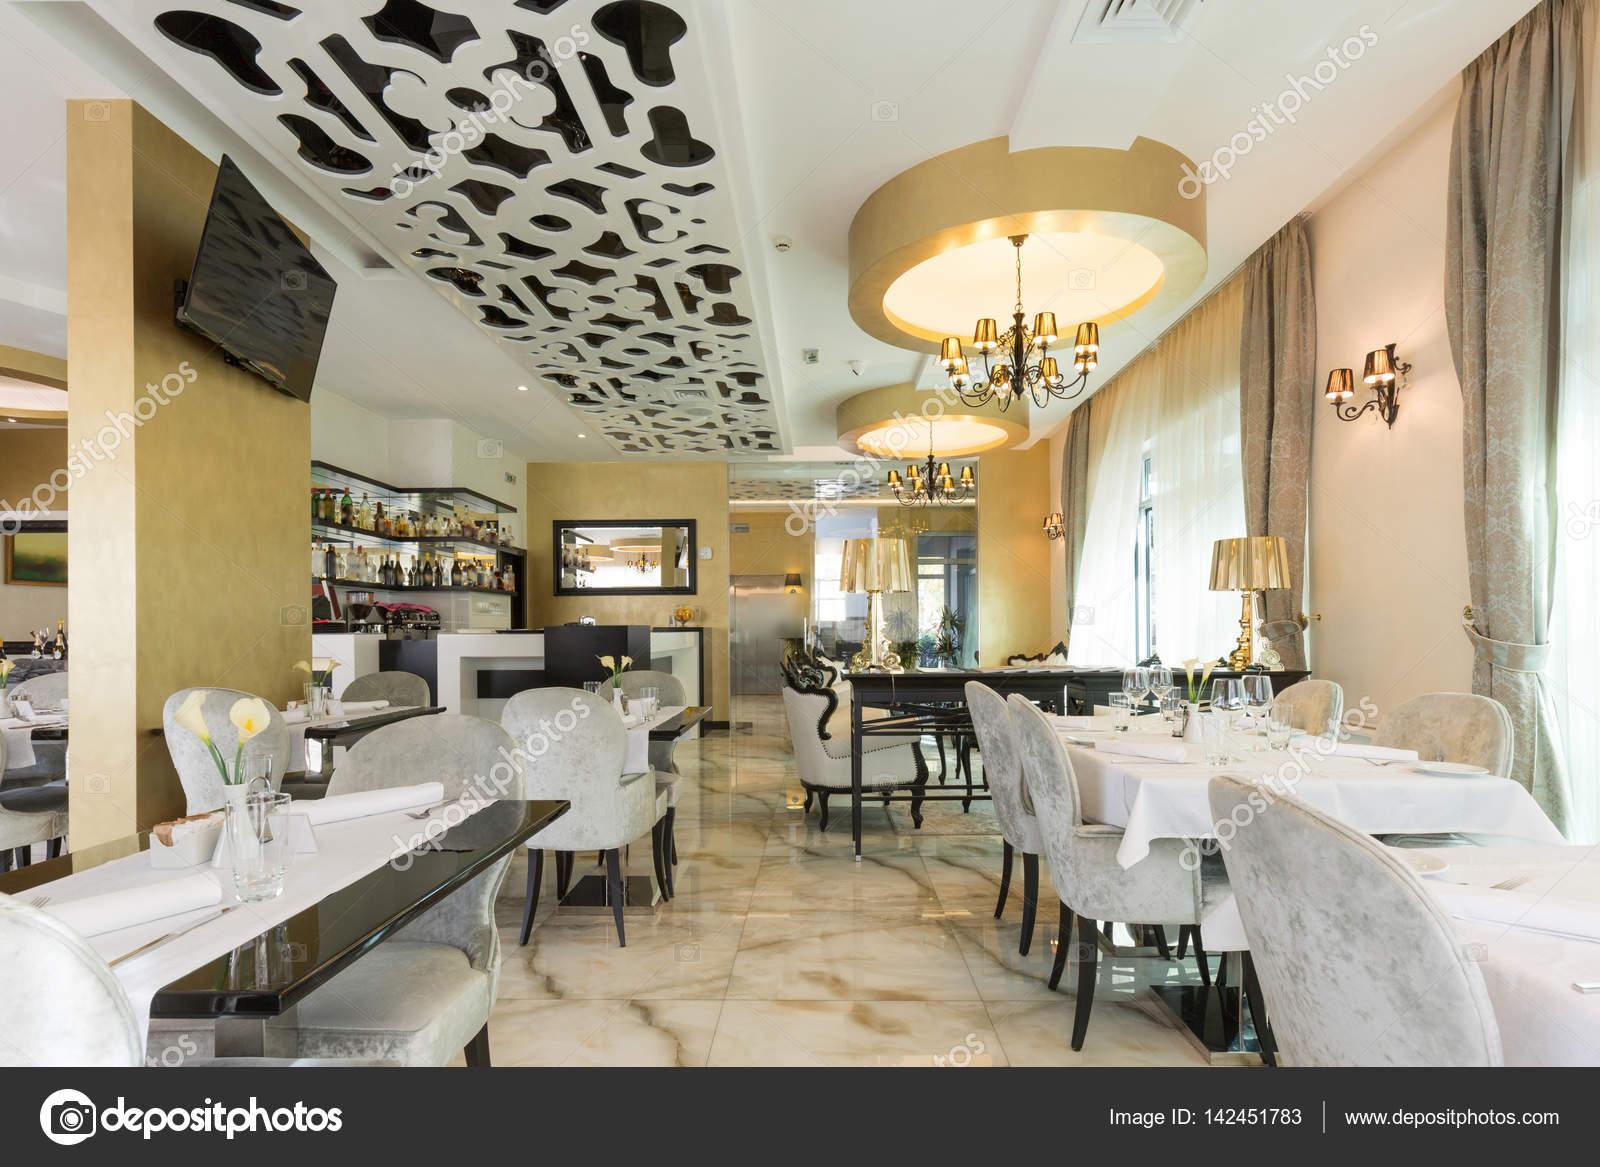 Interior Of A Modern Cafe Bar In Hotel Lobby Stock Photo C Rilueda 142451783